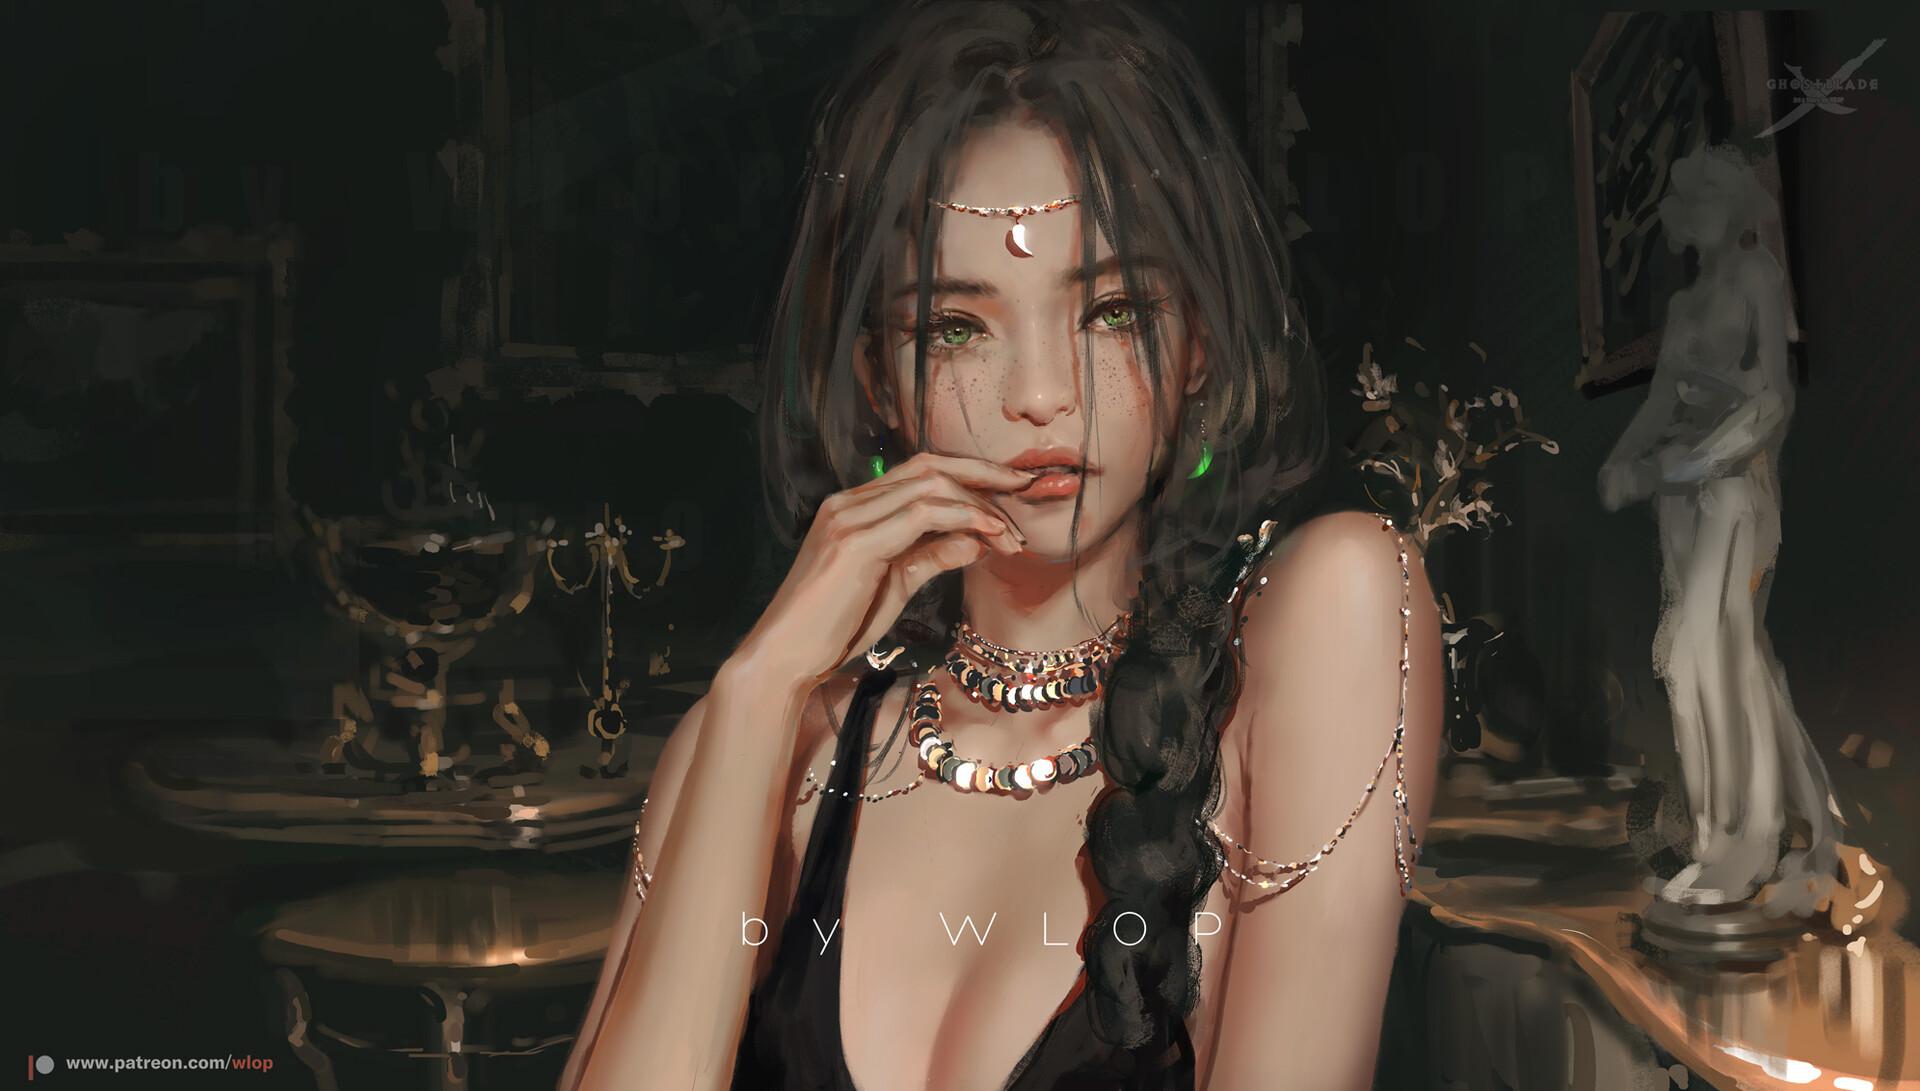 General 1920x1091 artwork women fantasy art fantasy girl women indoors green eyes brunette necklace WLOP Ghostblade